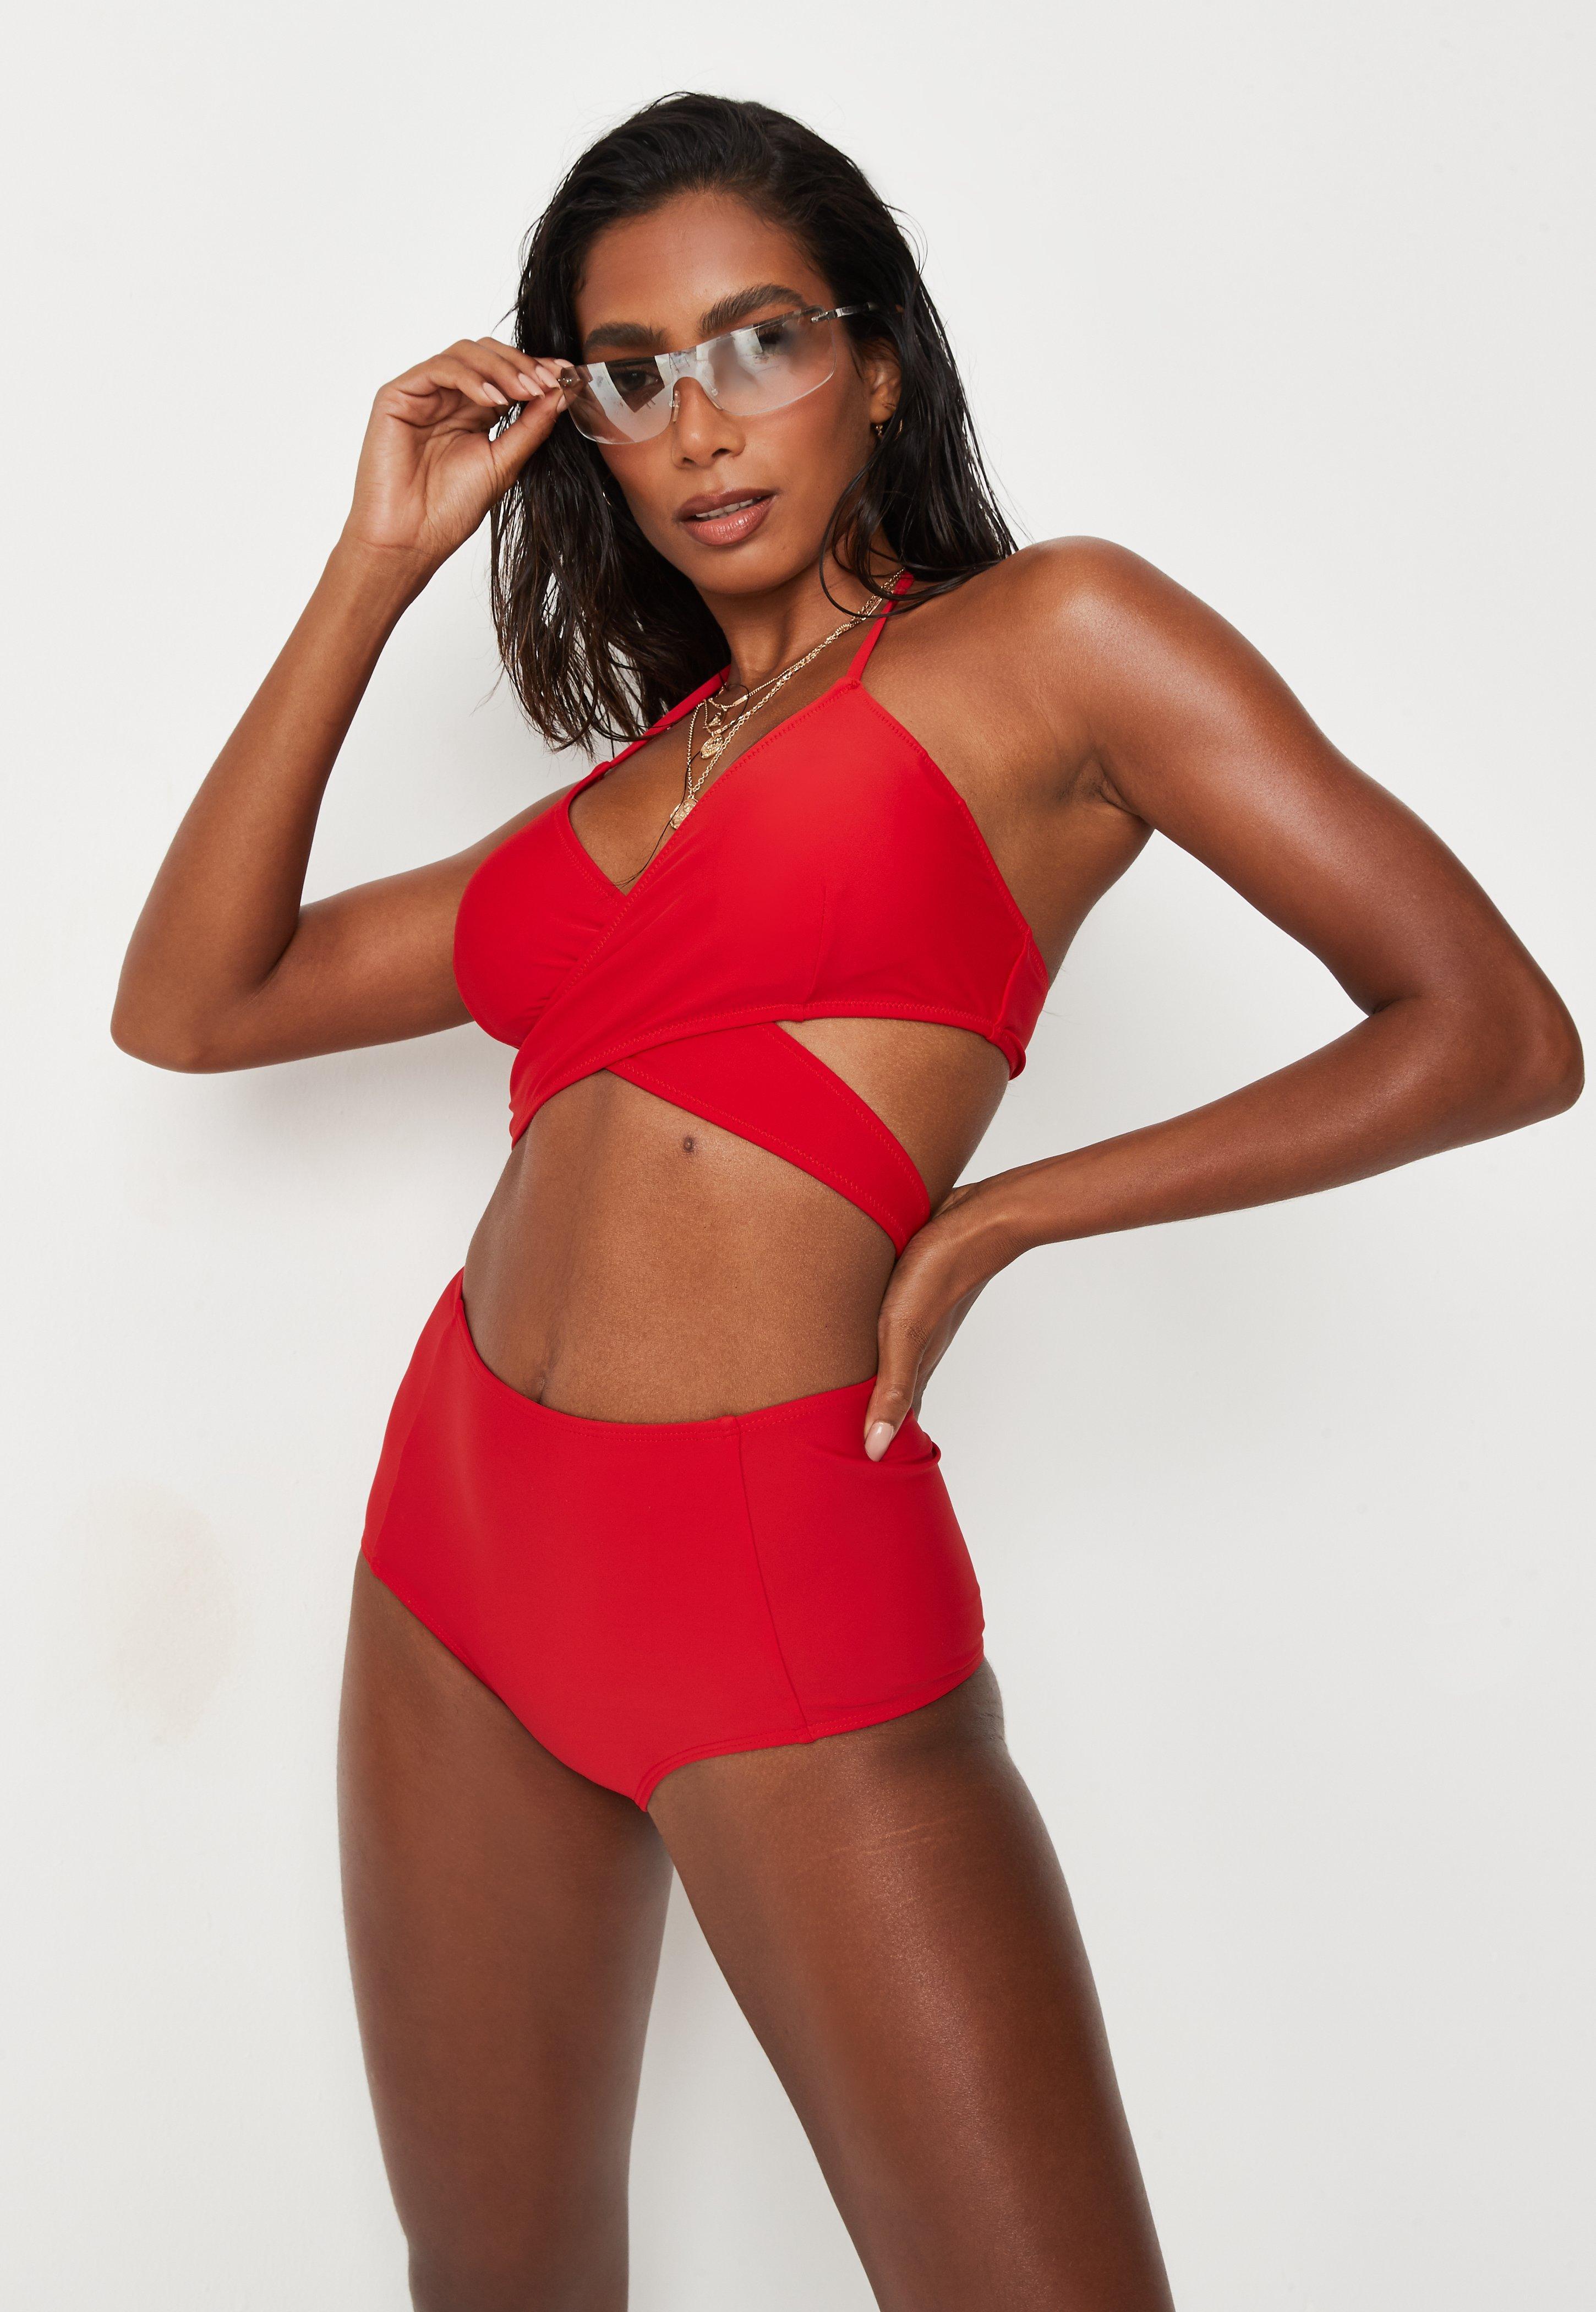 614e8e86887ef1 High Waist Bikinis   Bikinis mit hohem Bund - Missguided